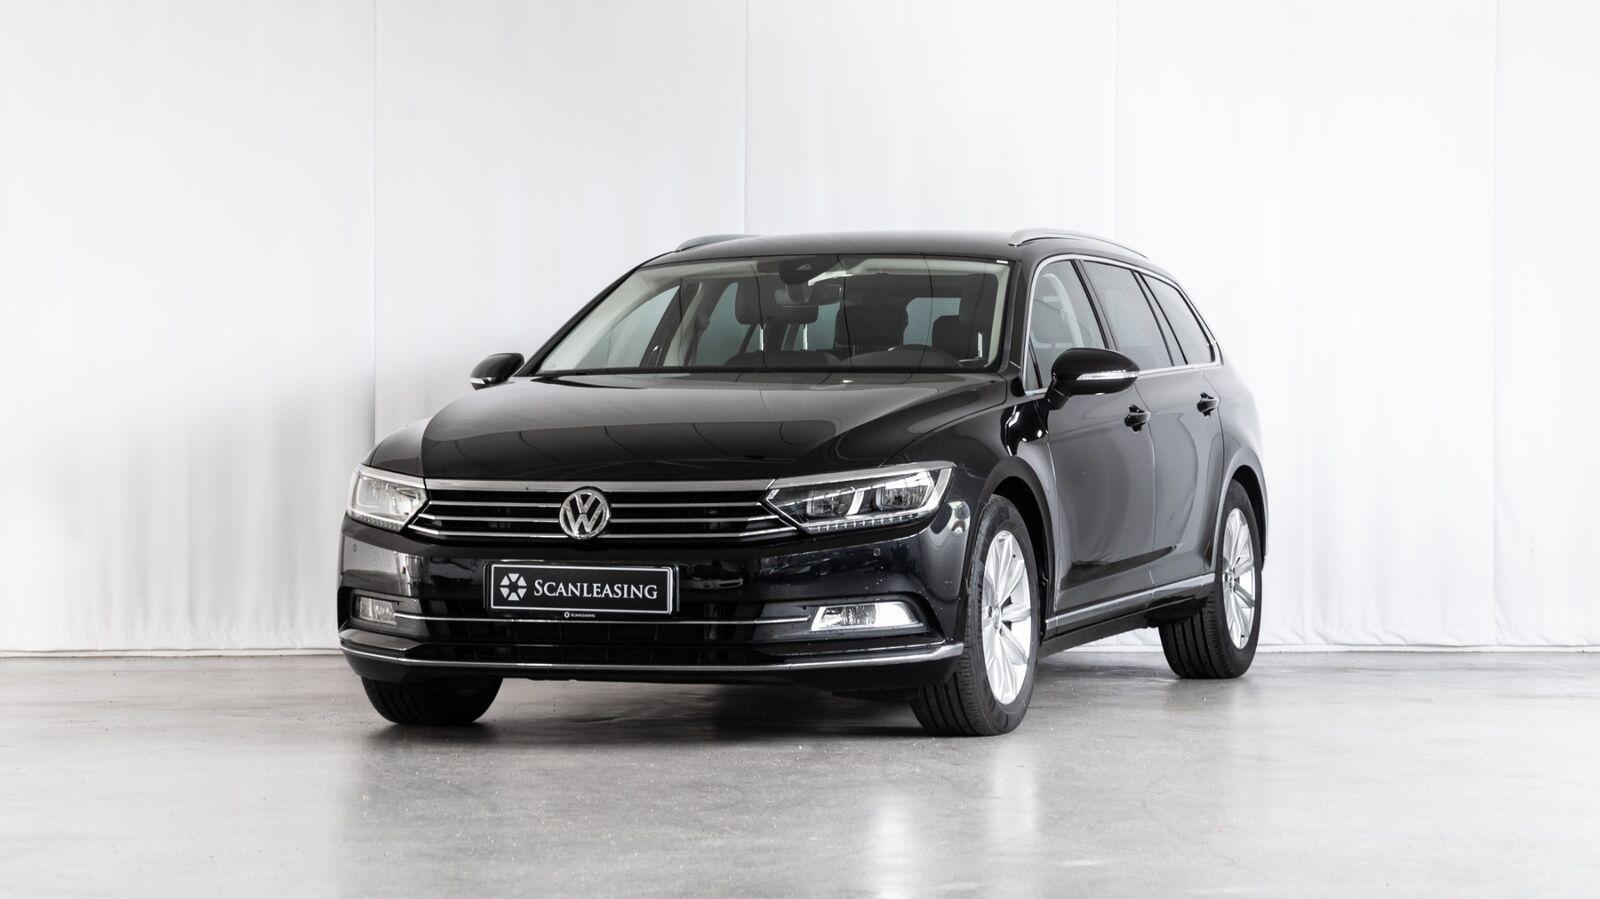 VW Passat 2,0 TDi 190 Highl. Variant DSG 5d - 369.900 kr.